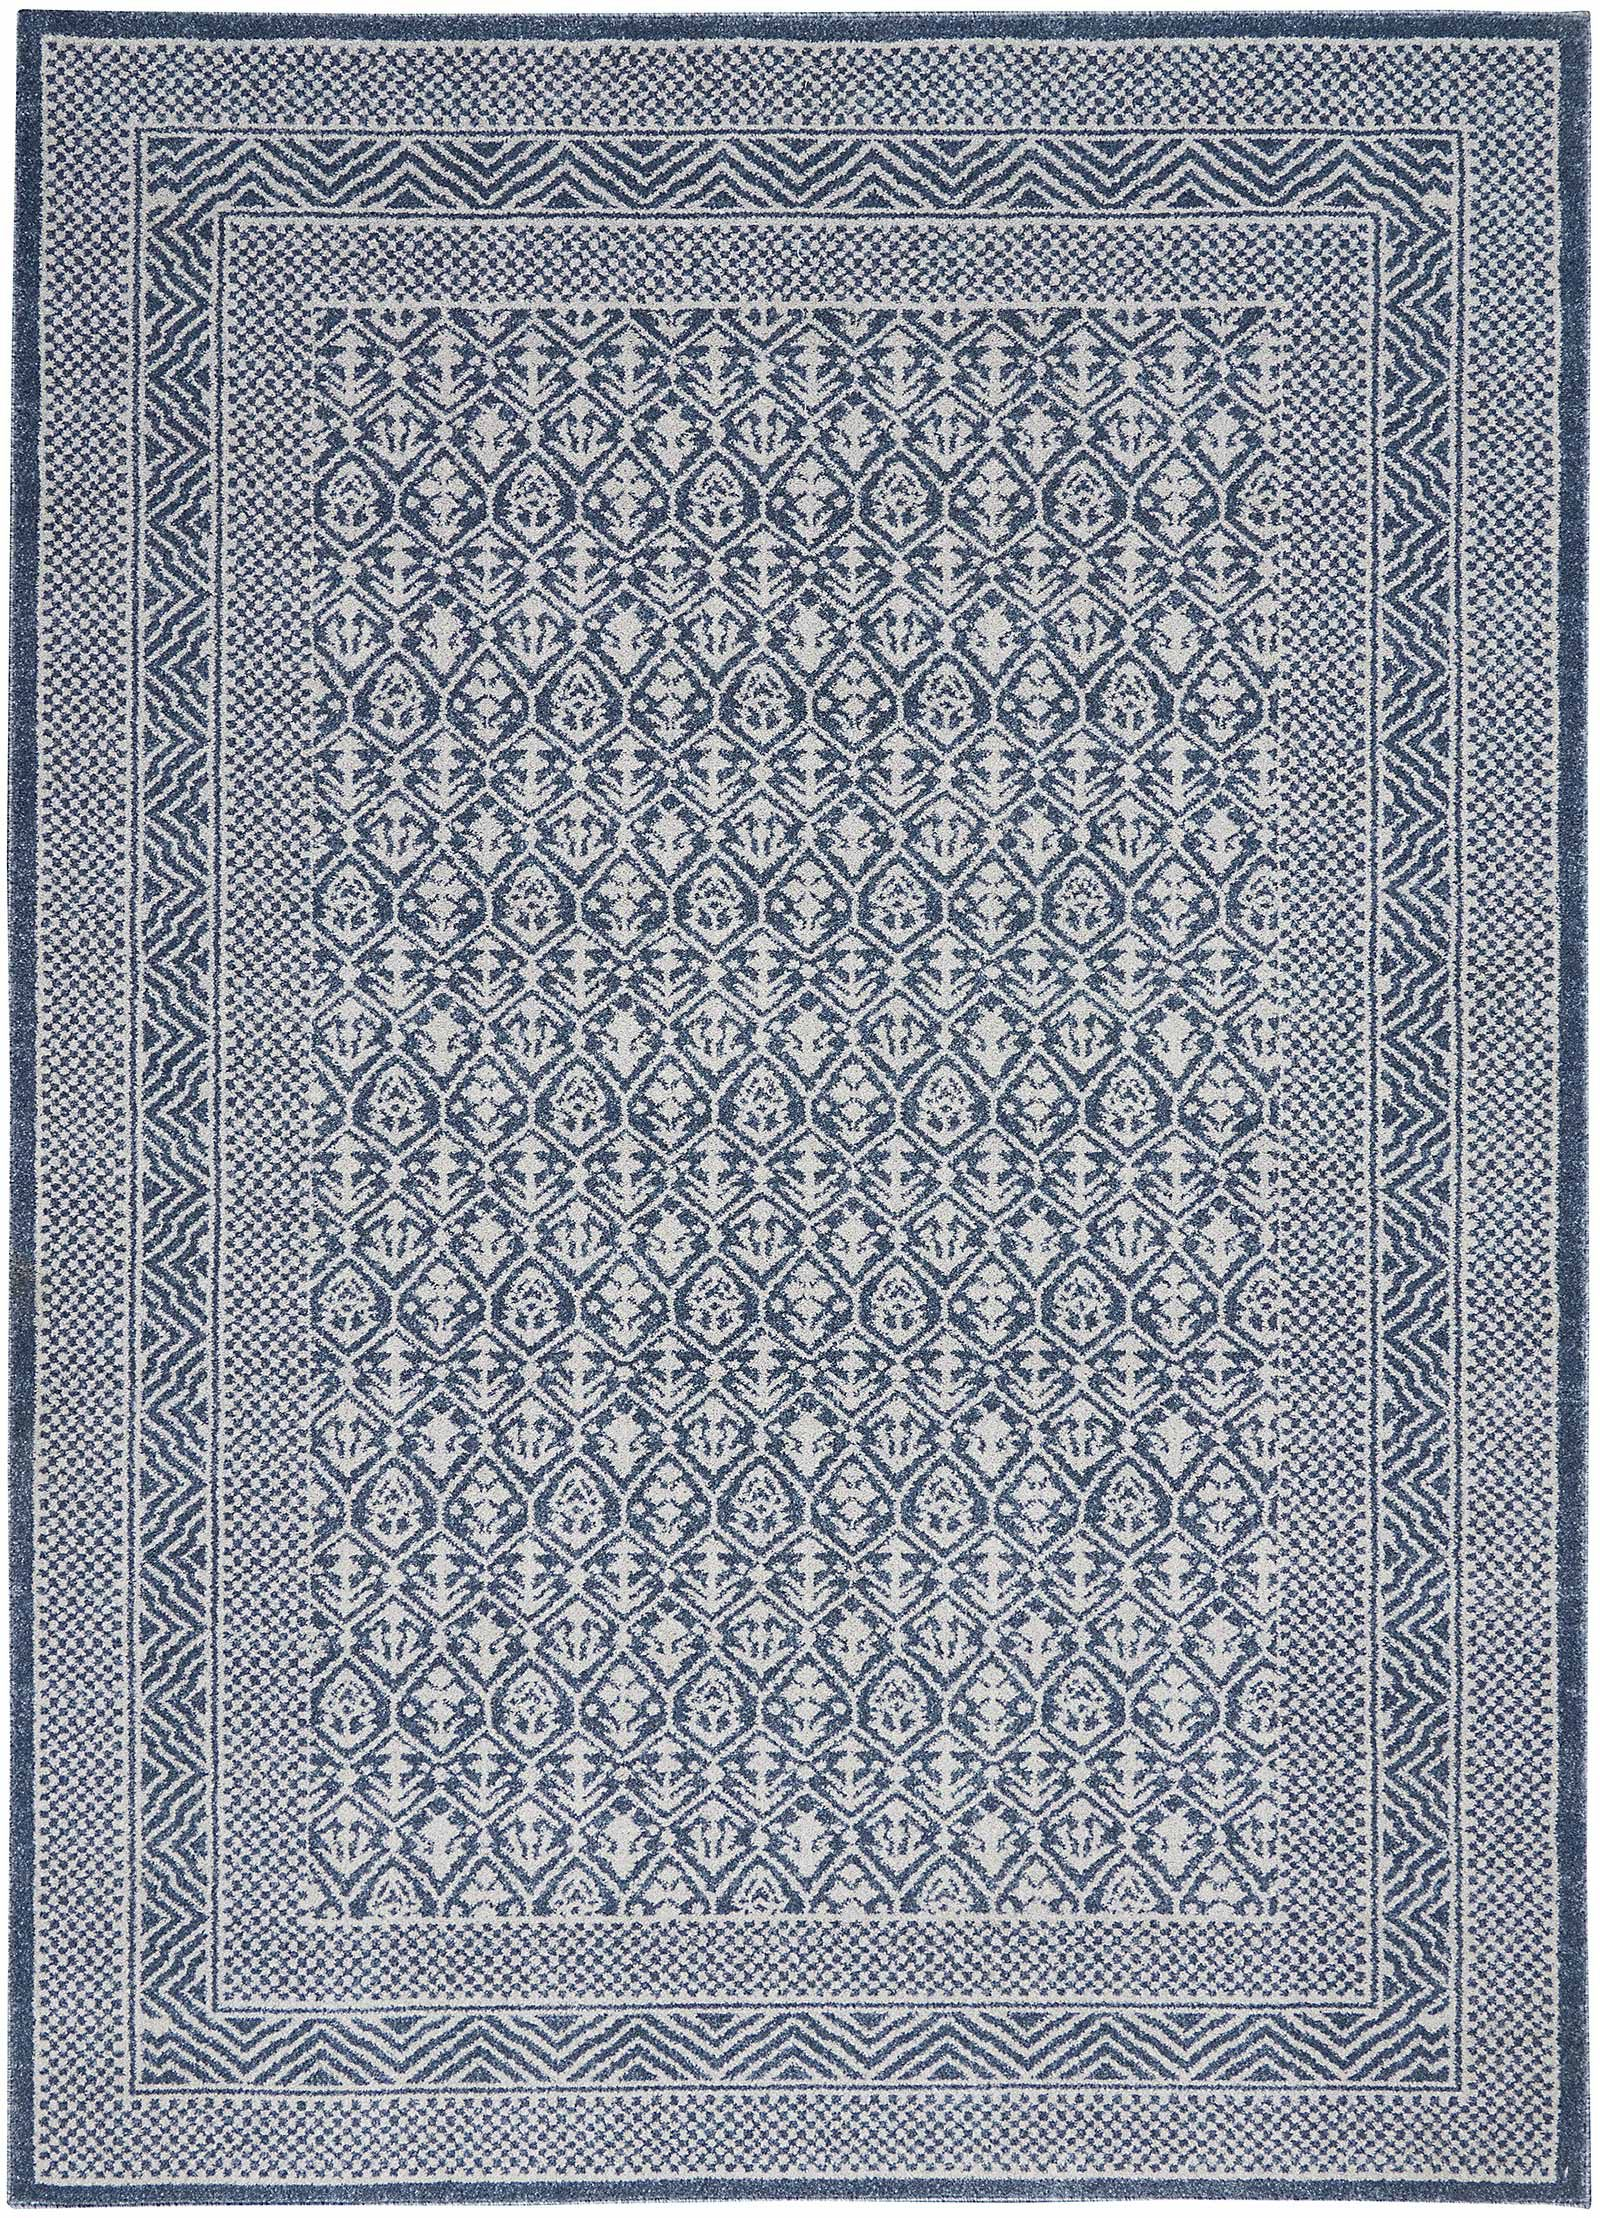 Nourison rug Palermo PMR01 BLUE GREY 5x7 099446719669 flat C